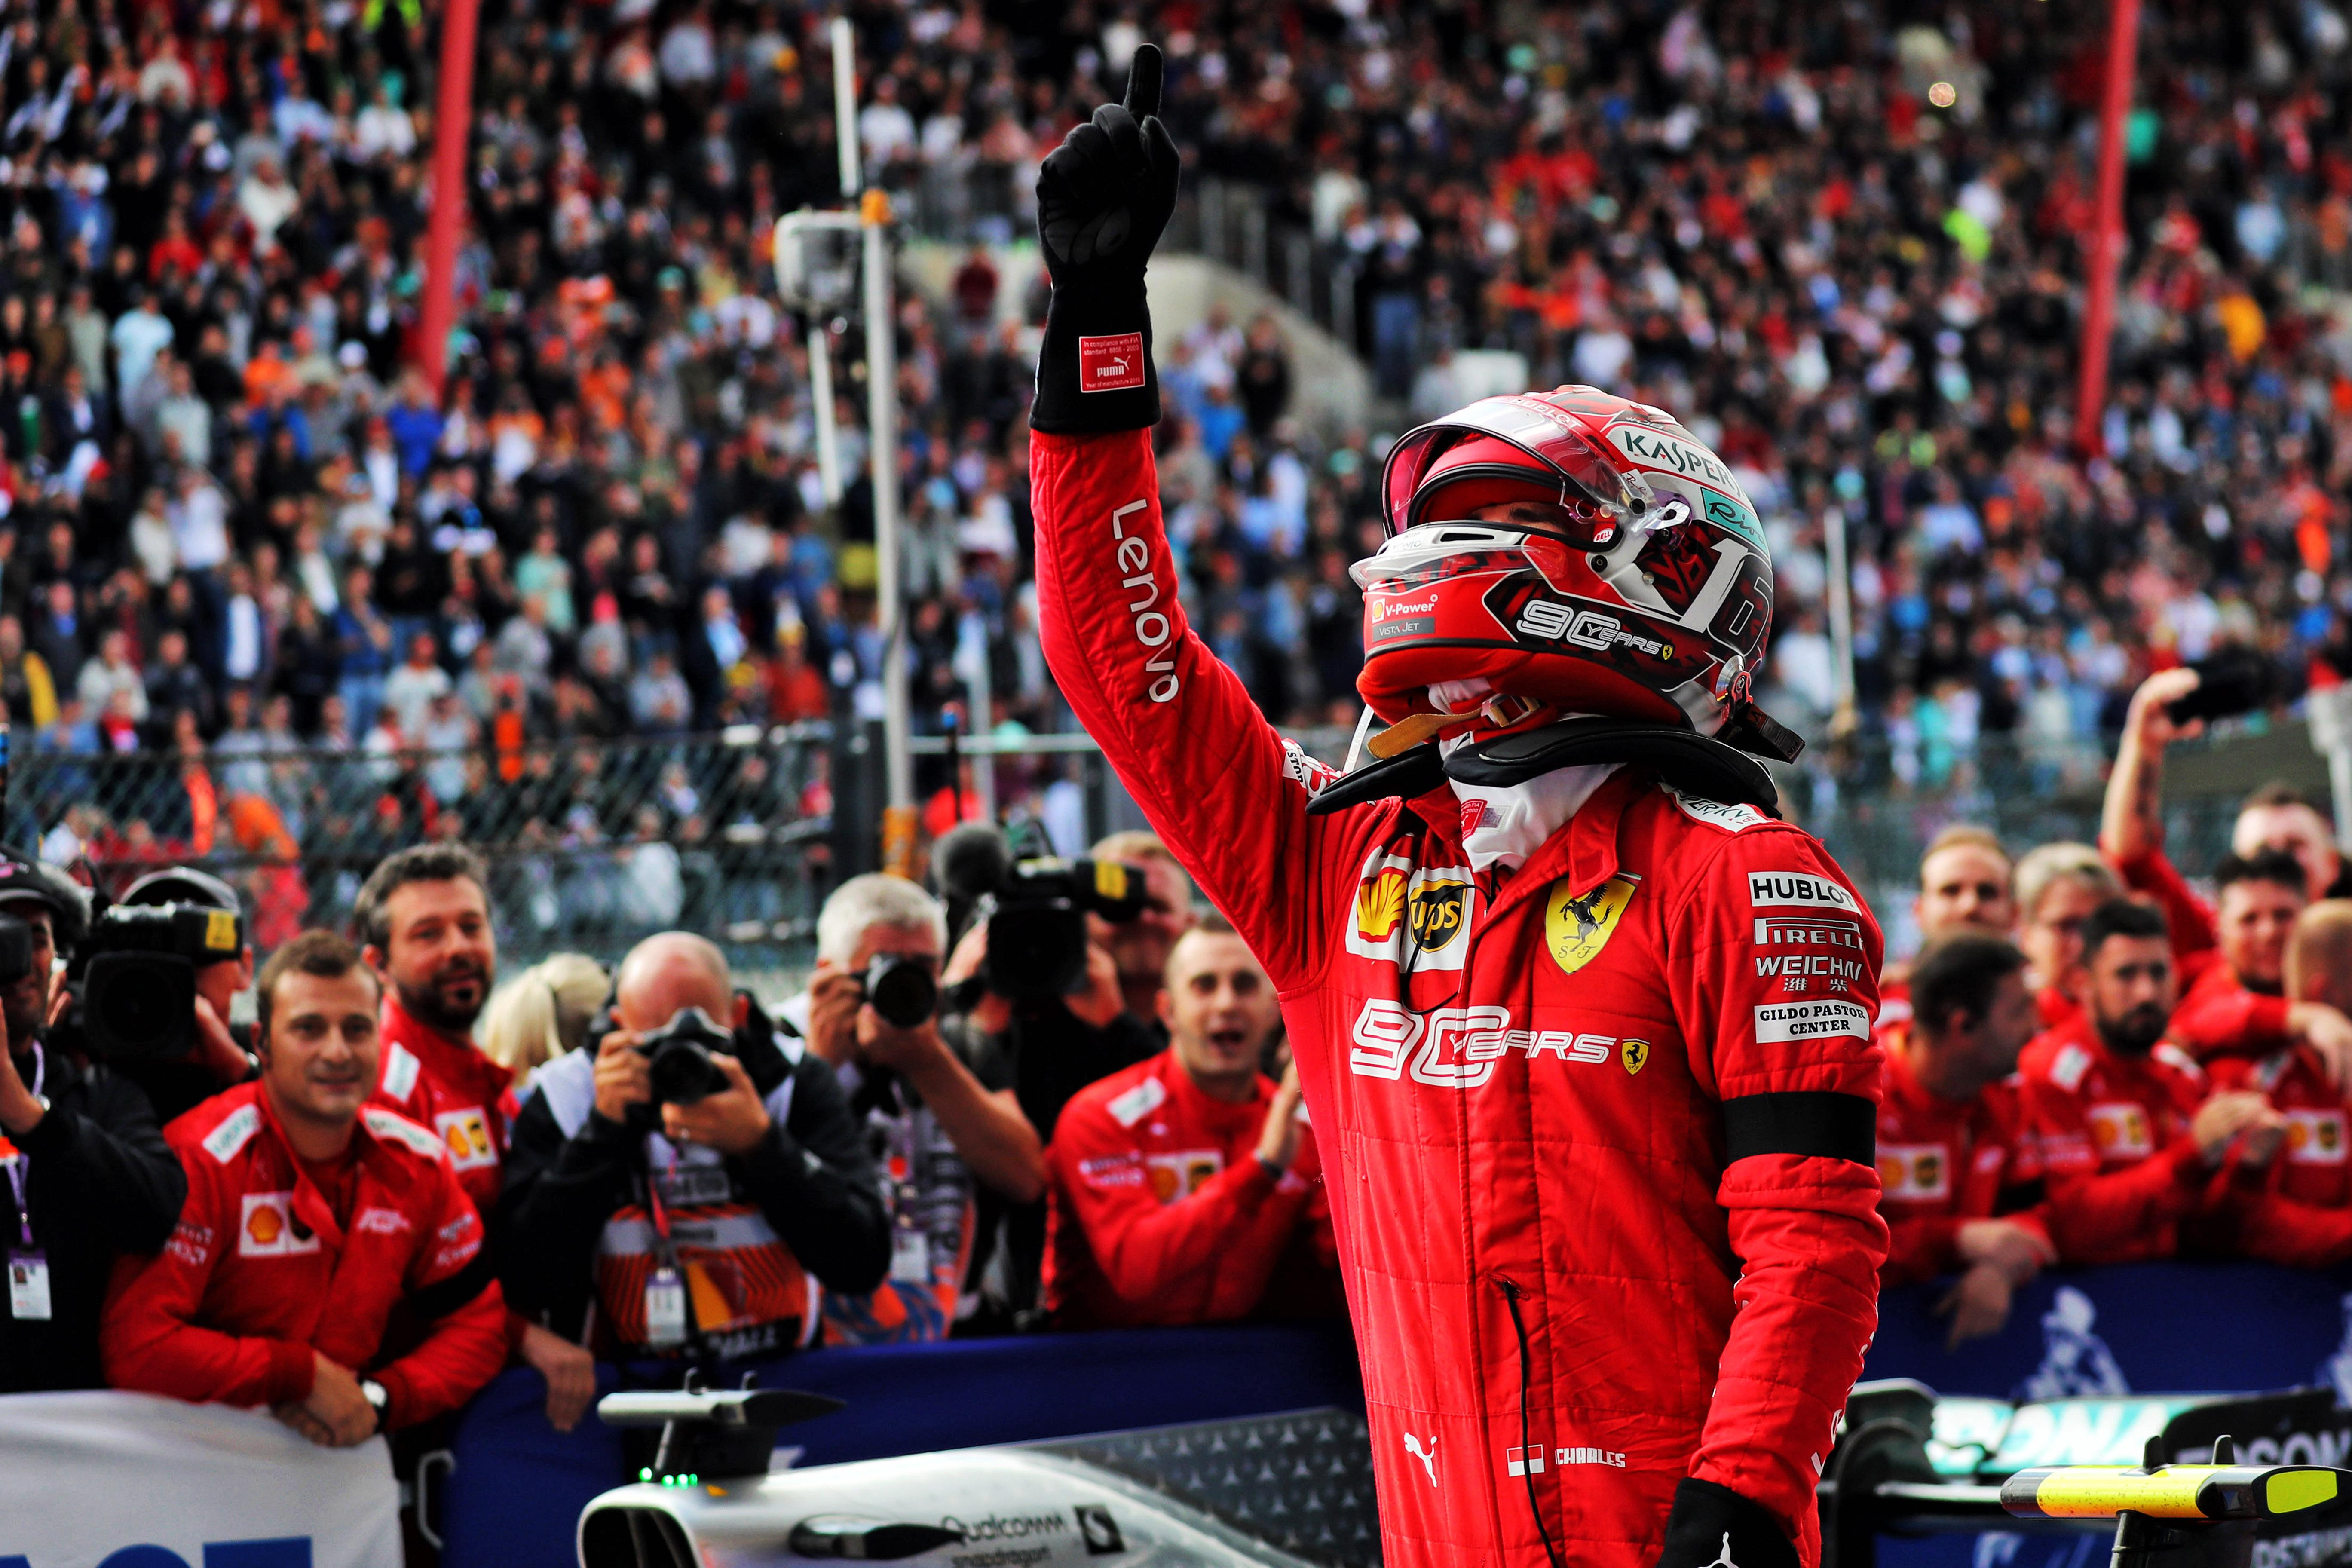 Charles Leclerc wins 2019 Belgian Grand Prix